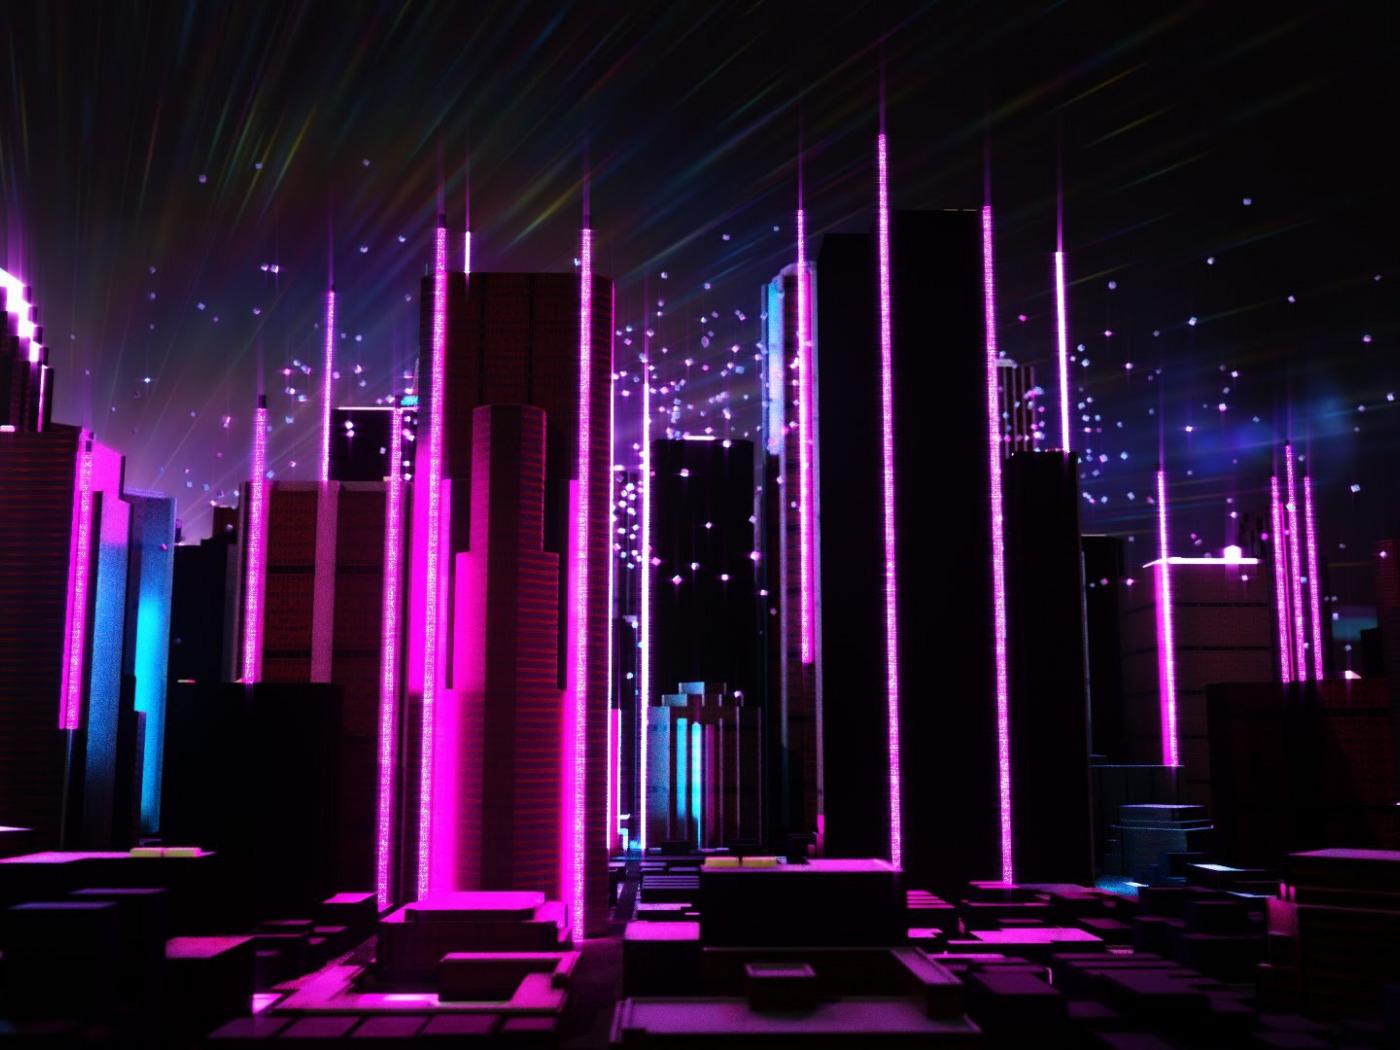 flashy neon lit night scene - HD1400×1050